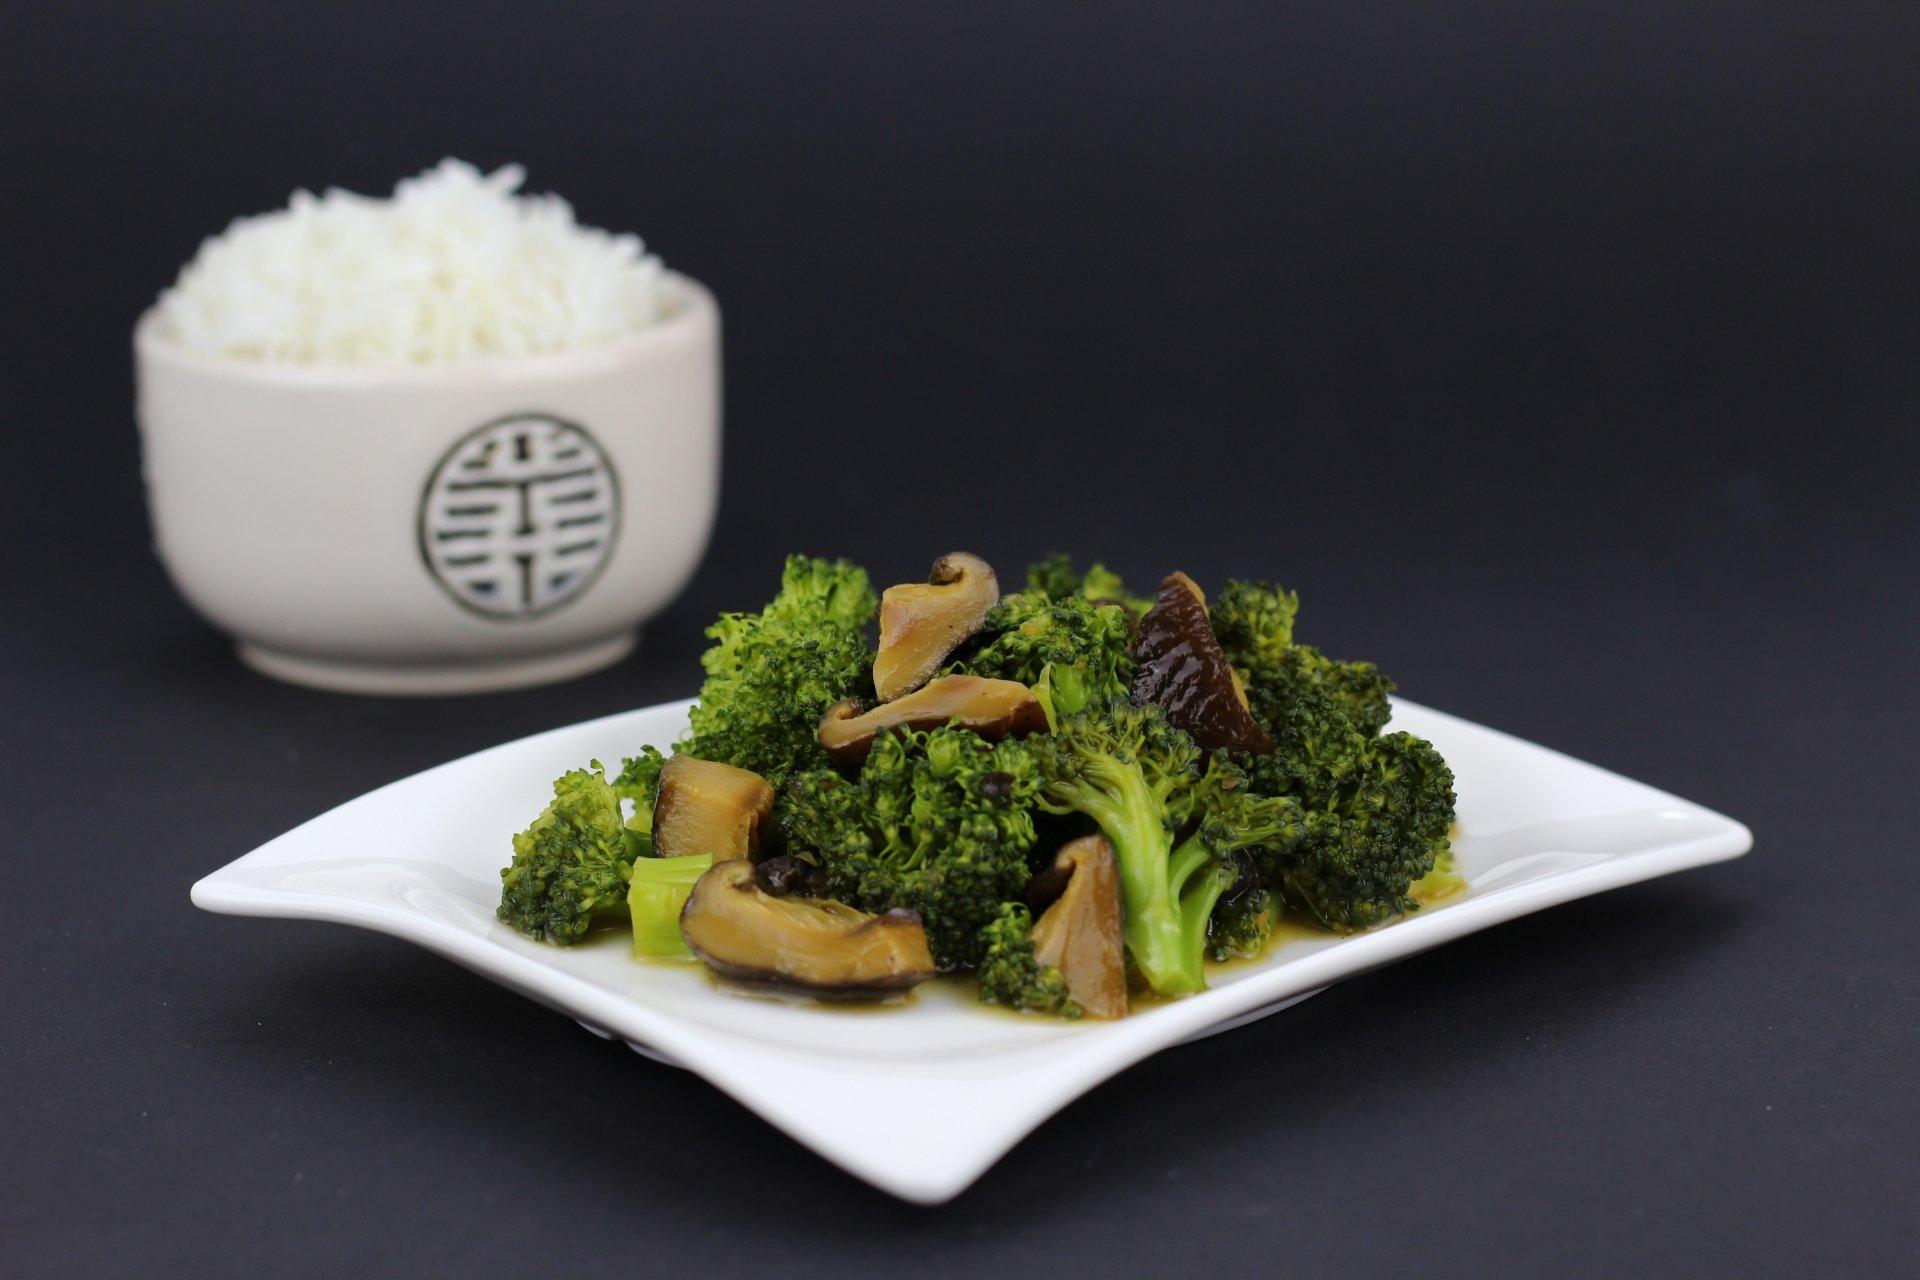 Food - Meal  Mushroom Broccoli Rice Wallpaper